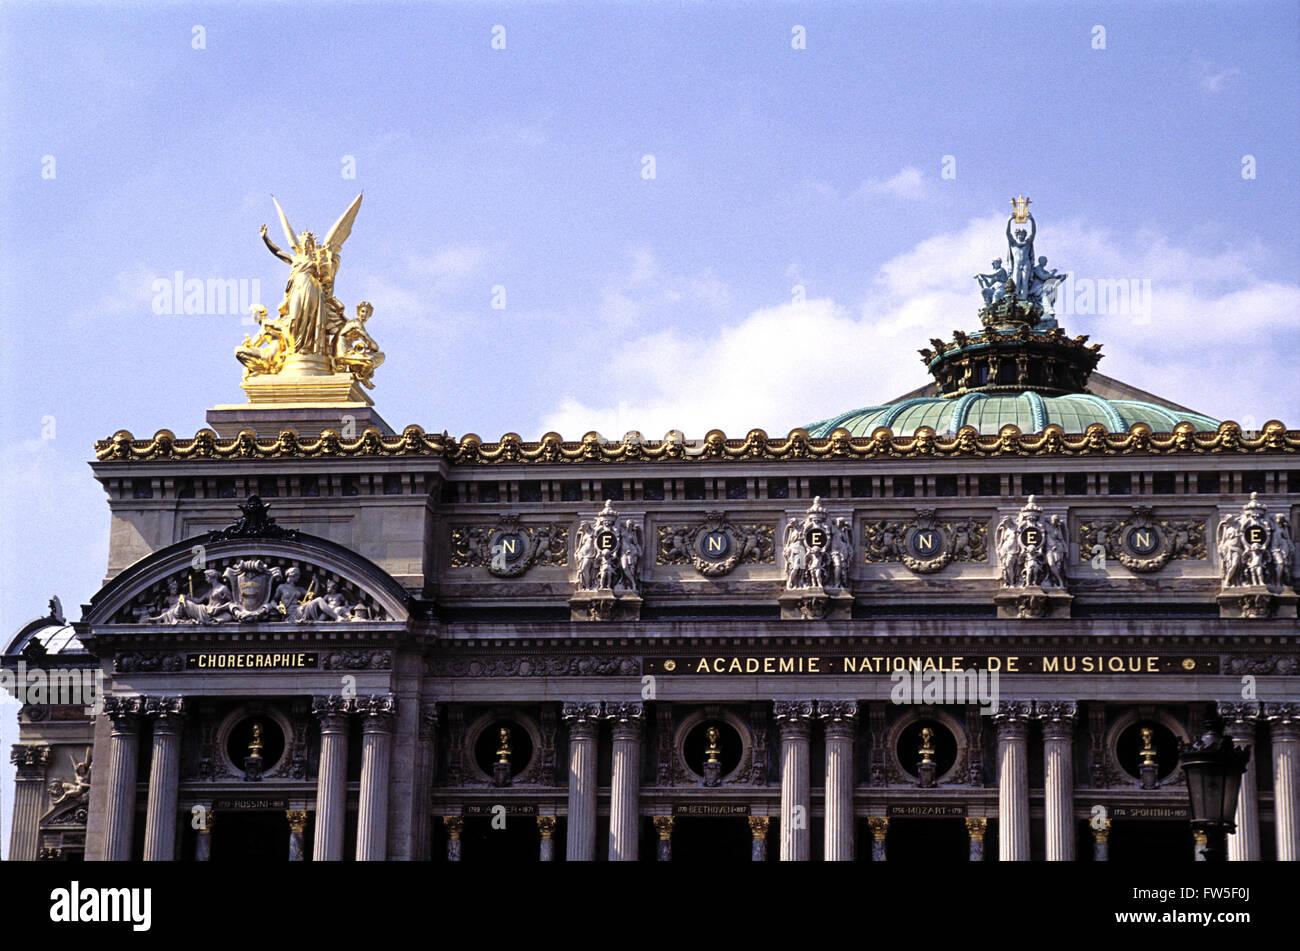 Opéra Garnier - Paris, France. Officially titled 'Academie Nationale de Musique'. Exterior showing - Stock Image